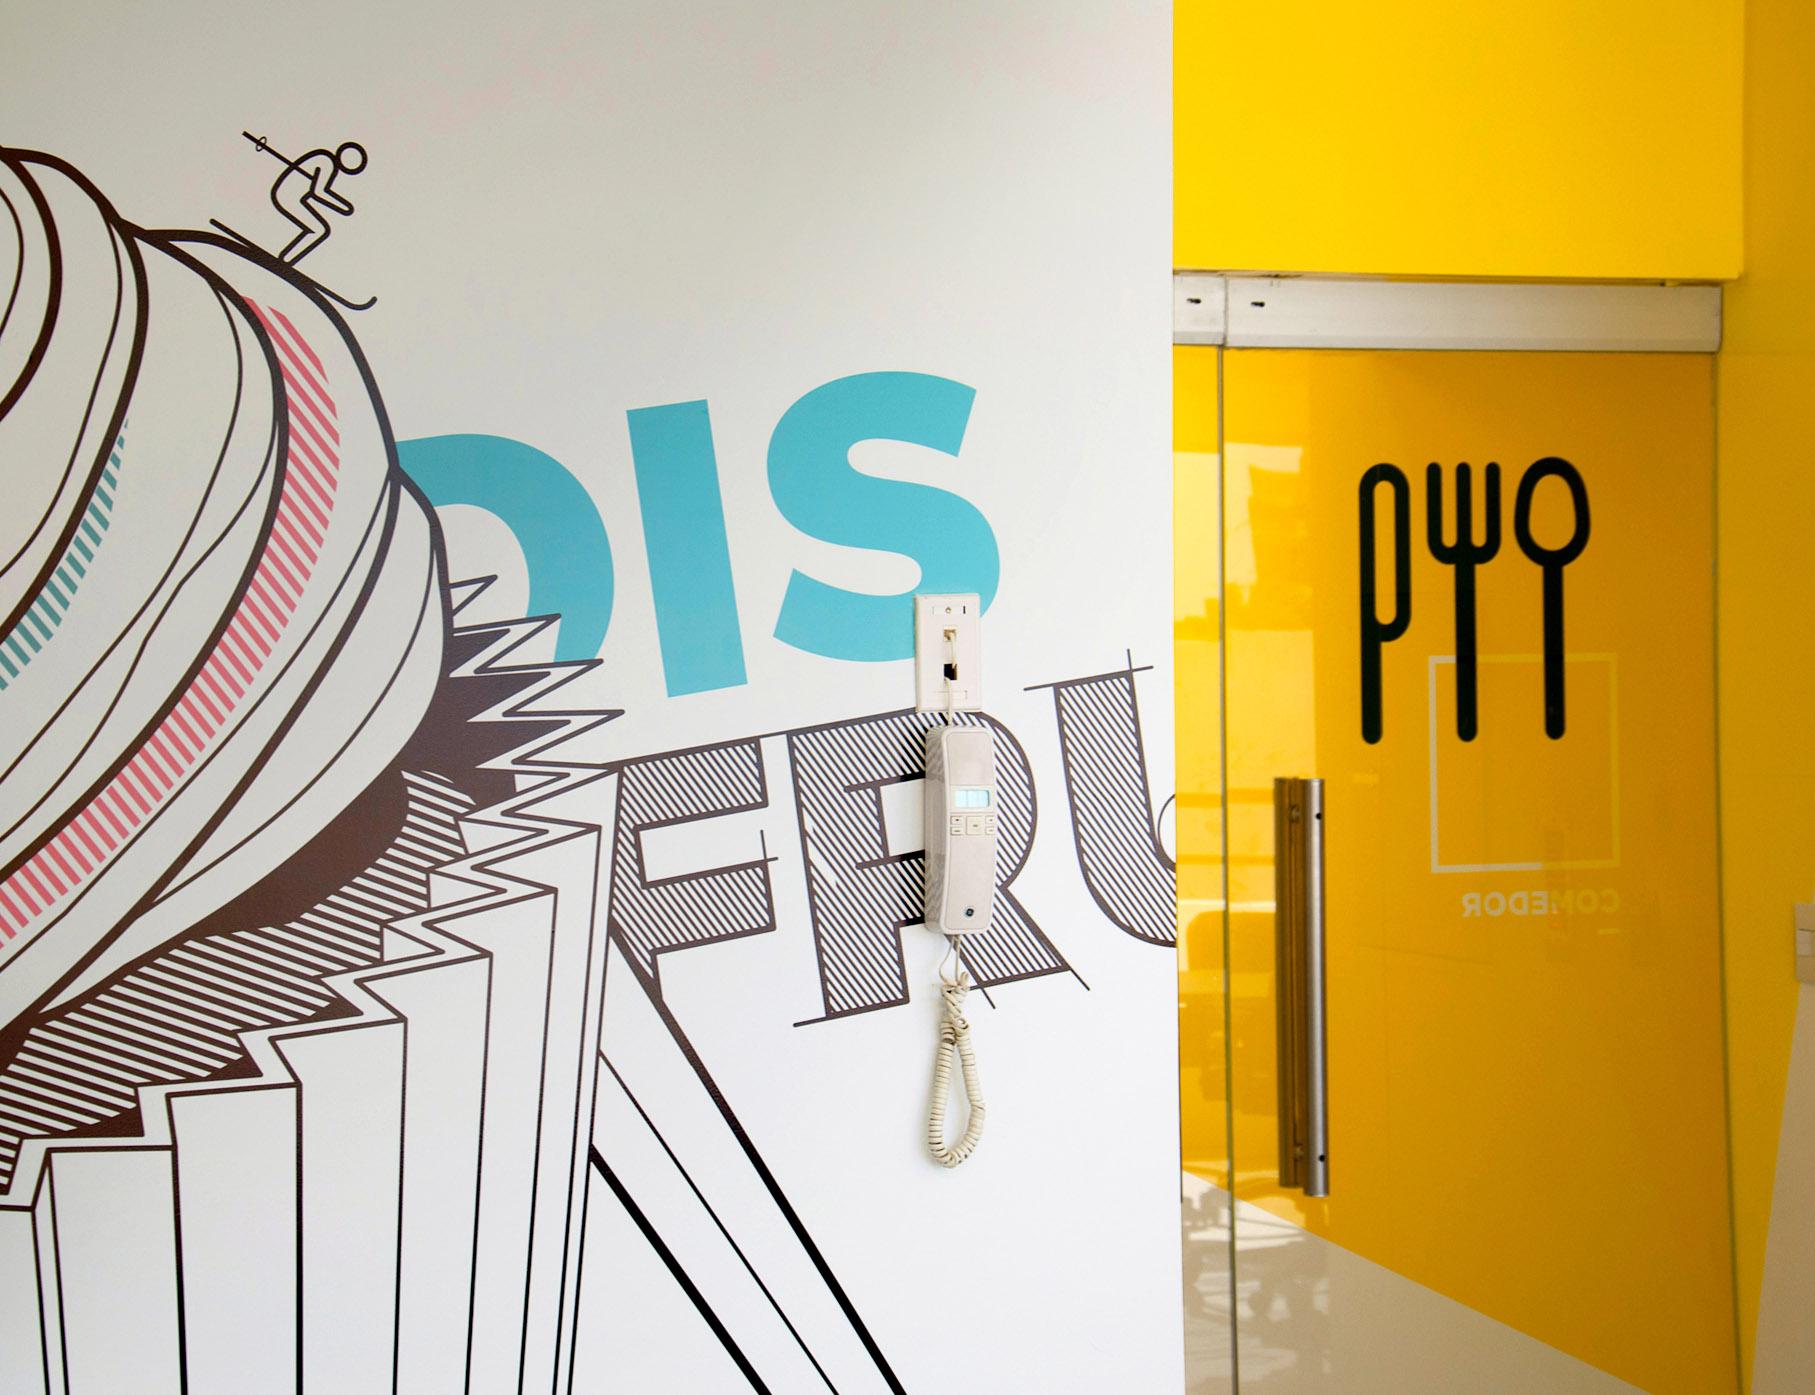 Artelum办公室标牌、指示系统设计及环境图形插画设计 © InPlace Design